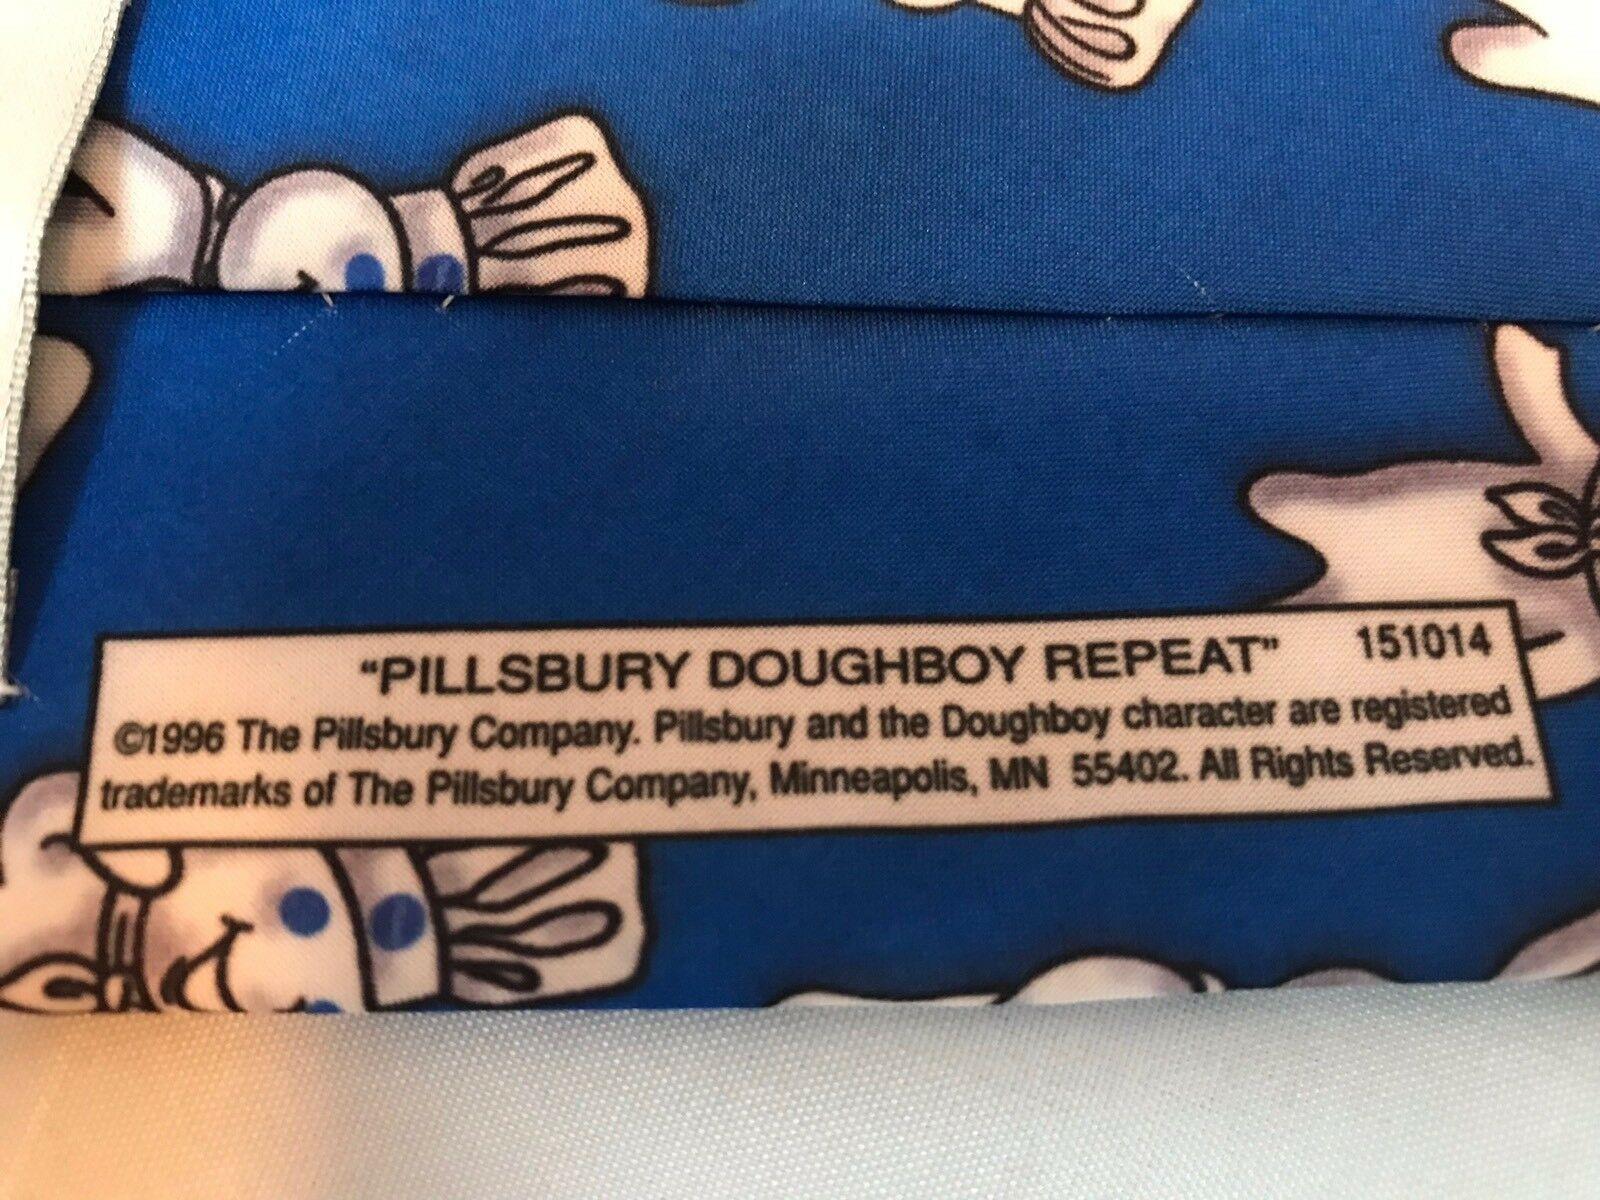 Pillsbury Dough Boy Repeat Ralph Marlin Blue Classic Men's Neck Tie 1996 image 4